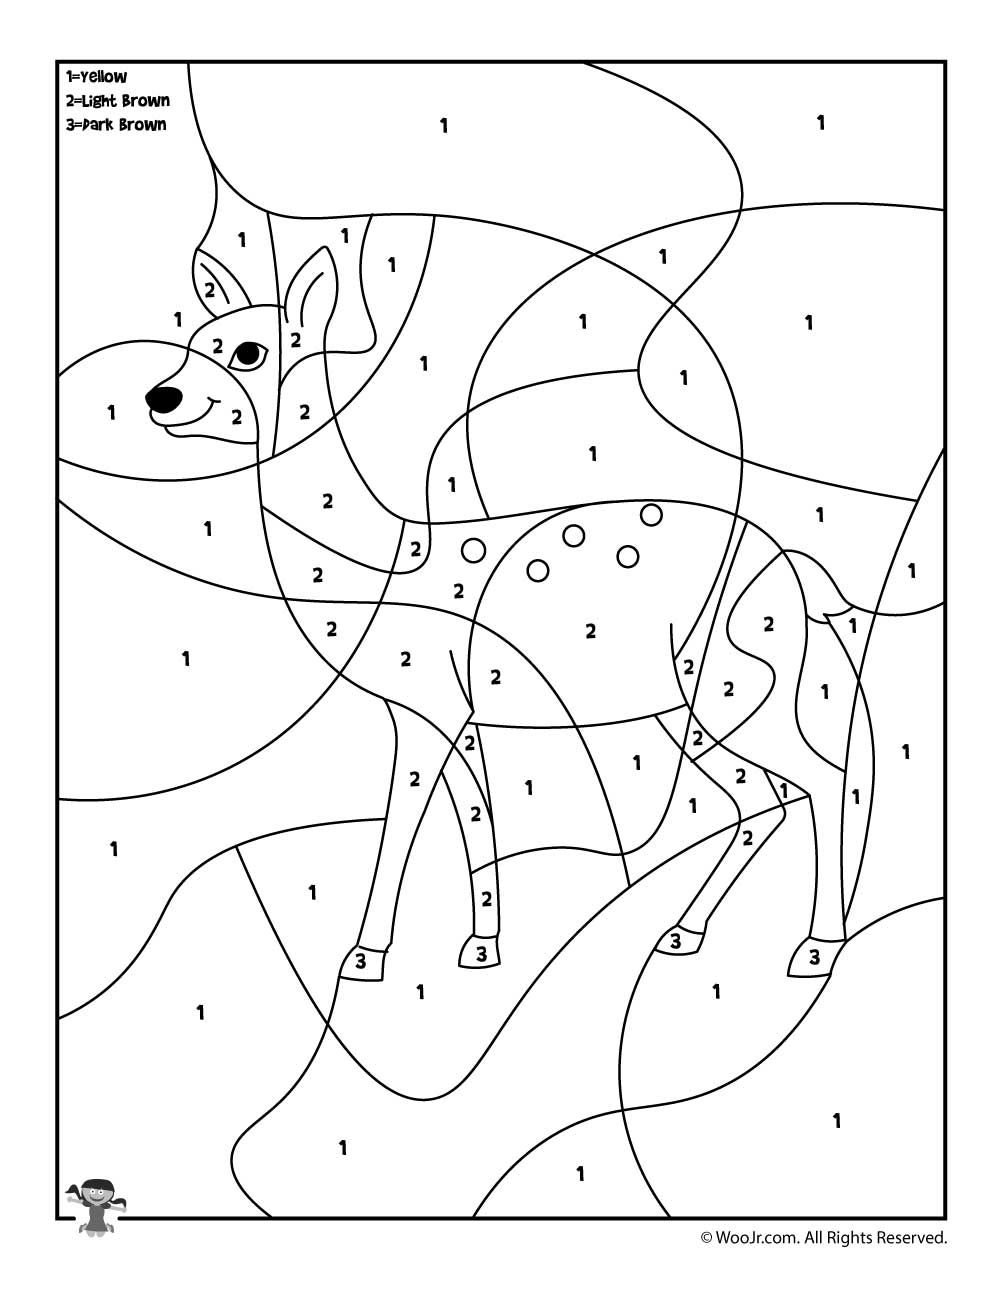 Preschool Color By Number Animal Coloring Pages Woo Jr Kids Activities Coloring Pages Animal Coloring Pages Preschool Colors